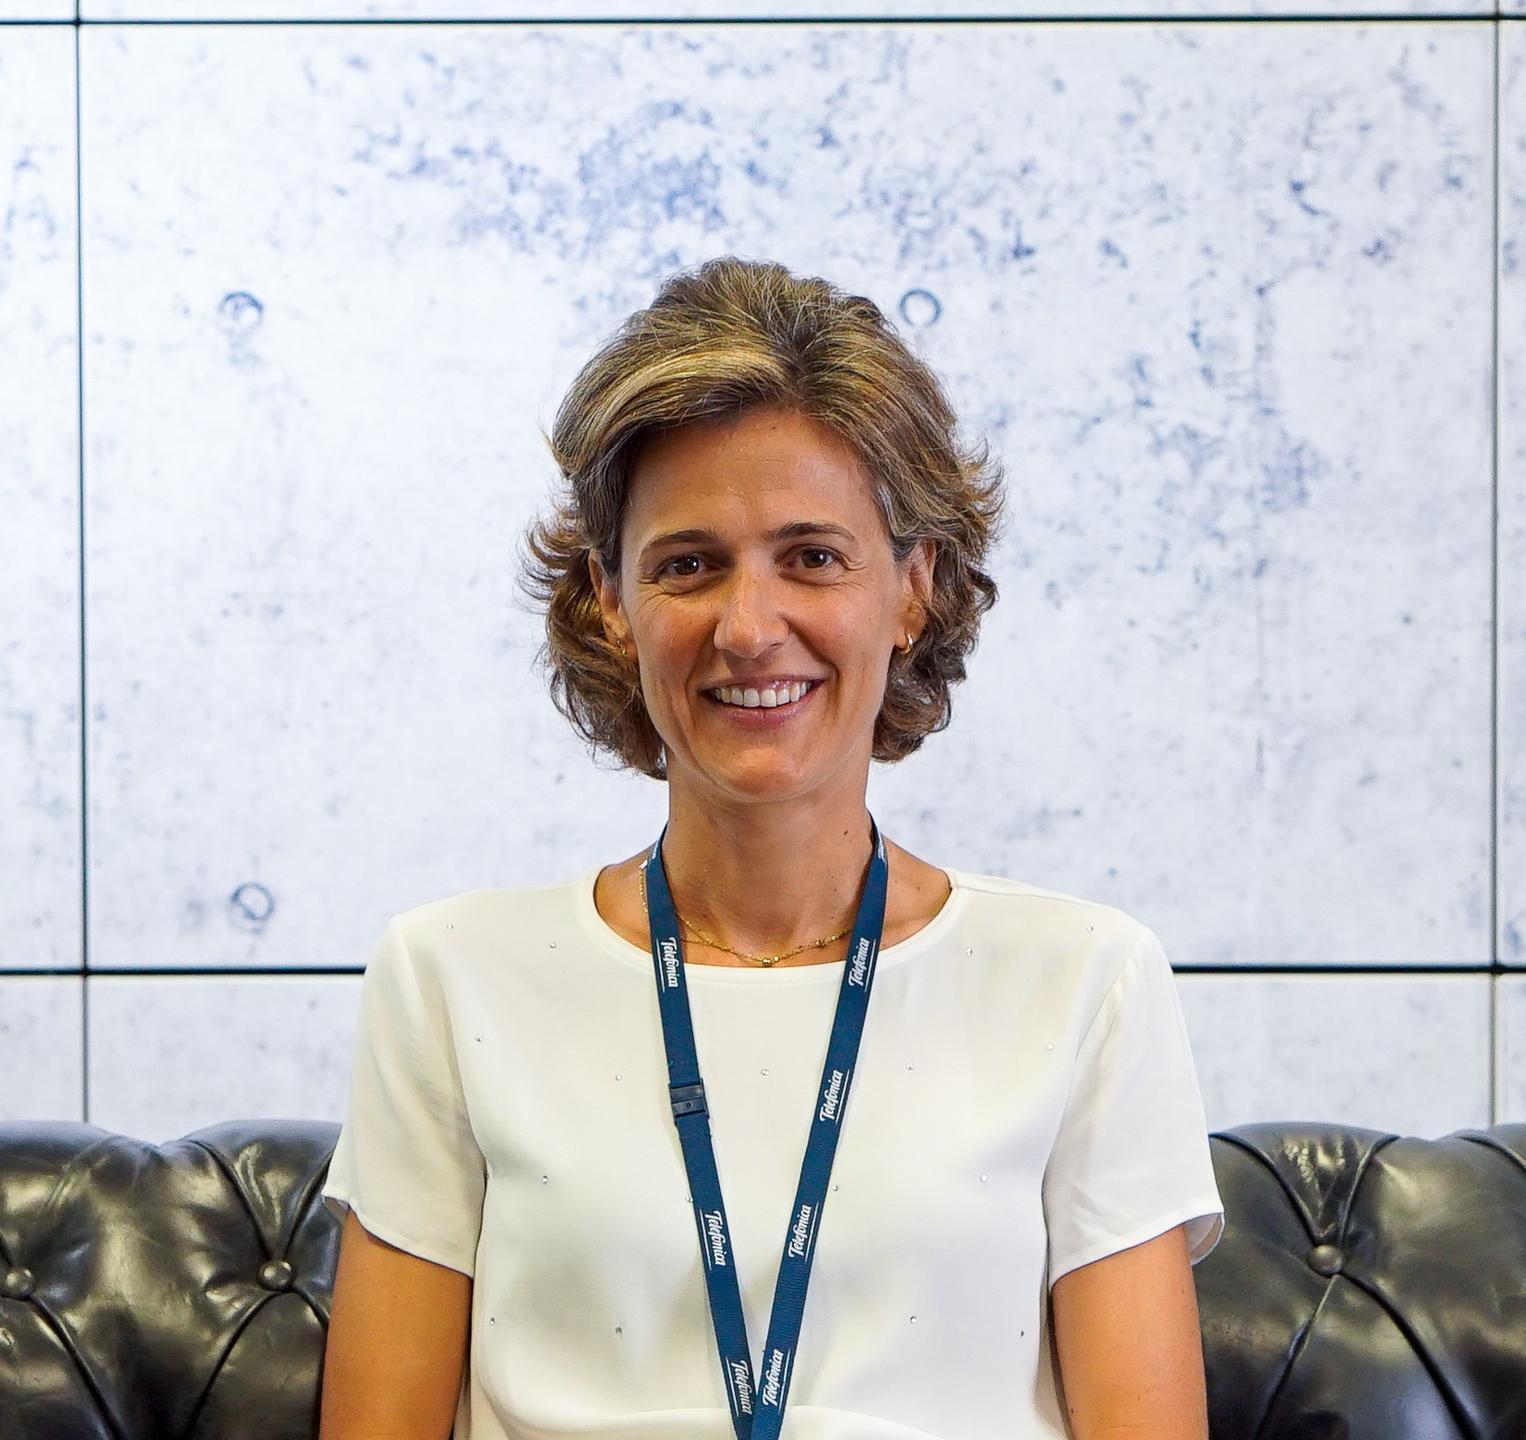 Arancha Diaz-Lladó Director of Sustainable Innovation en Telefónica